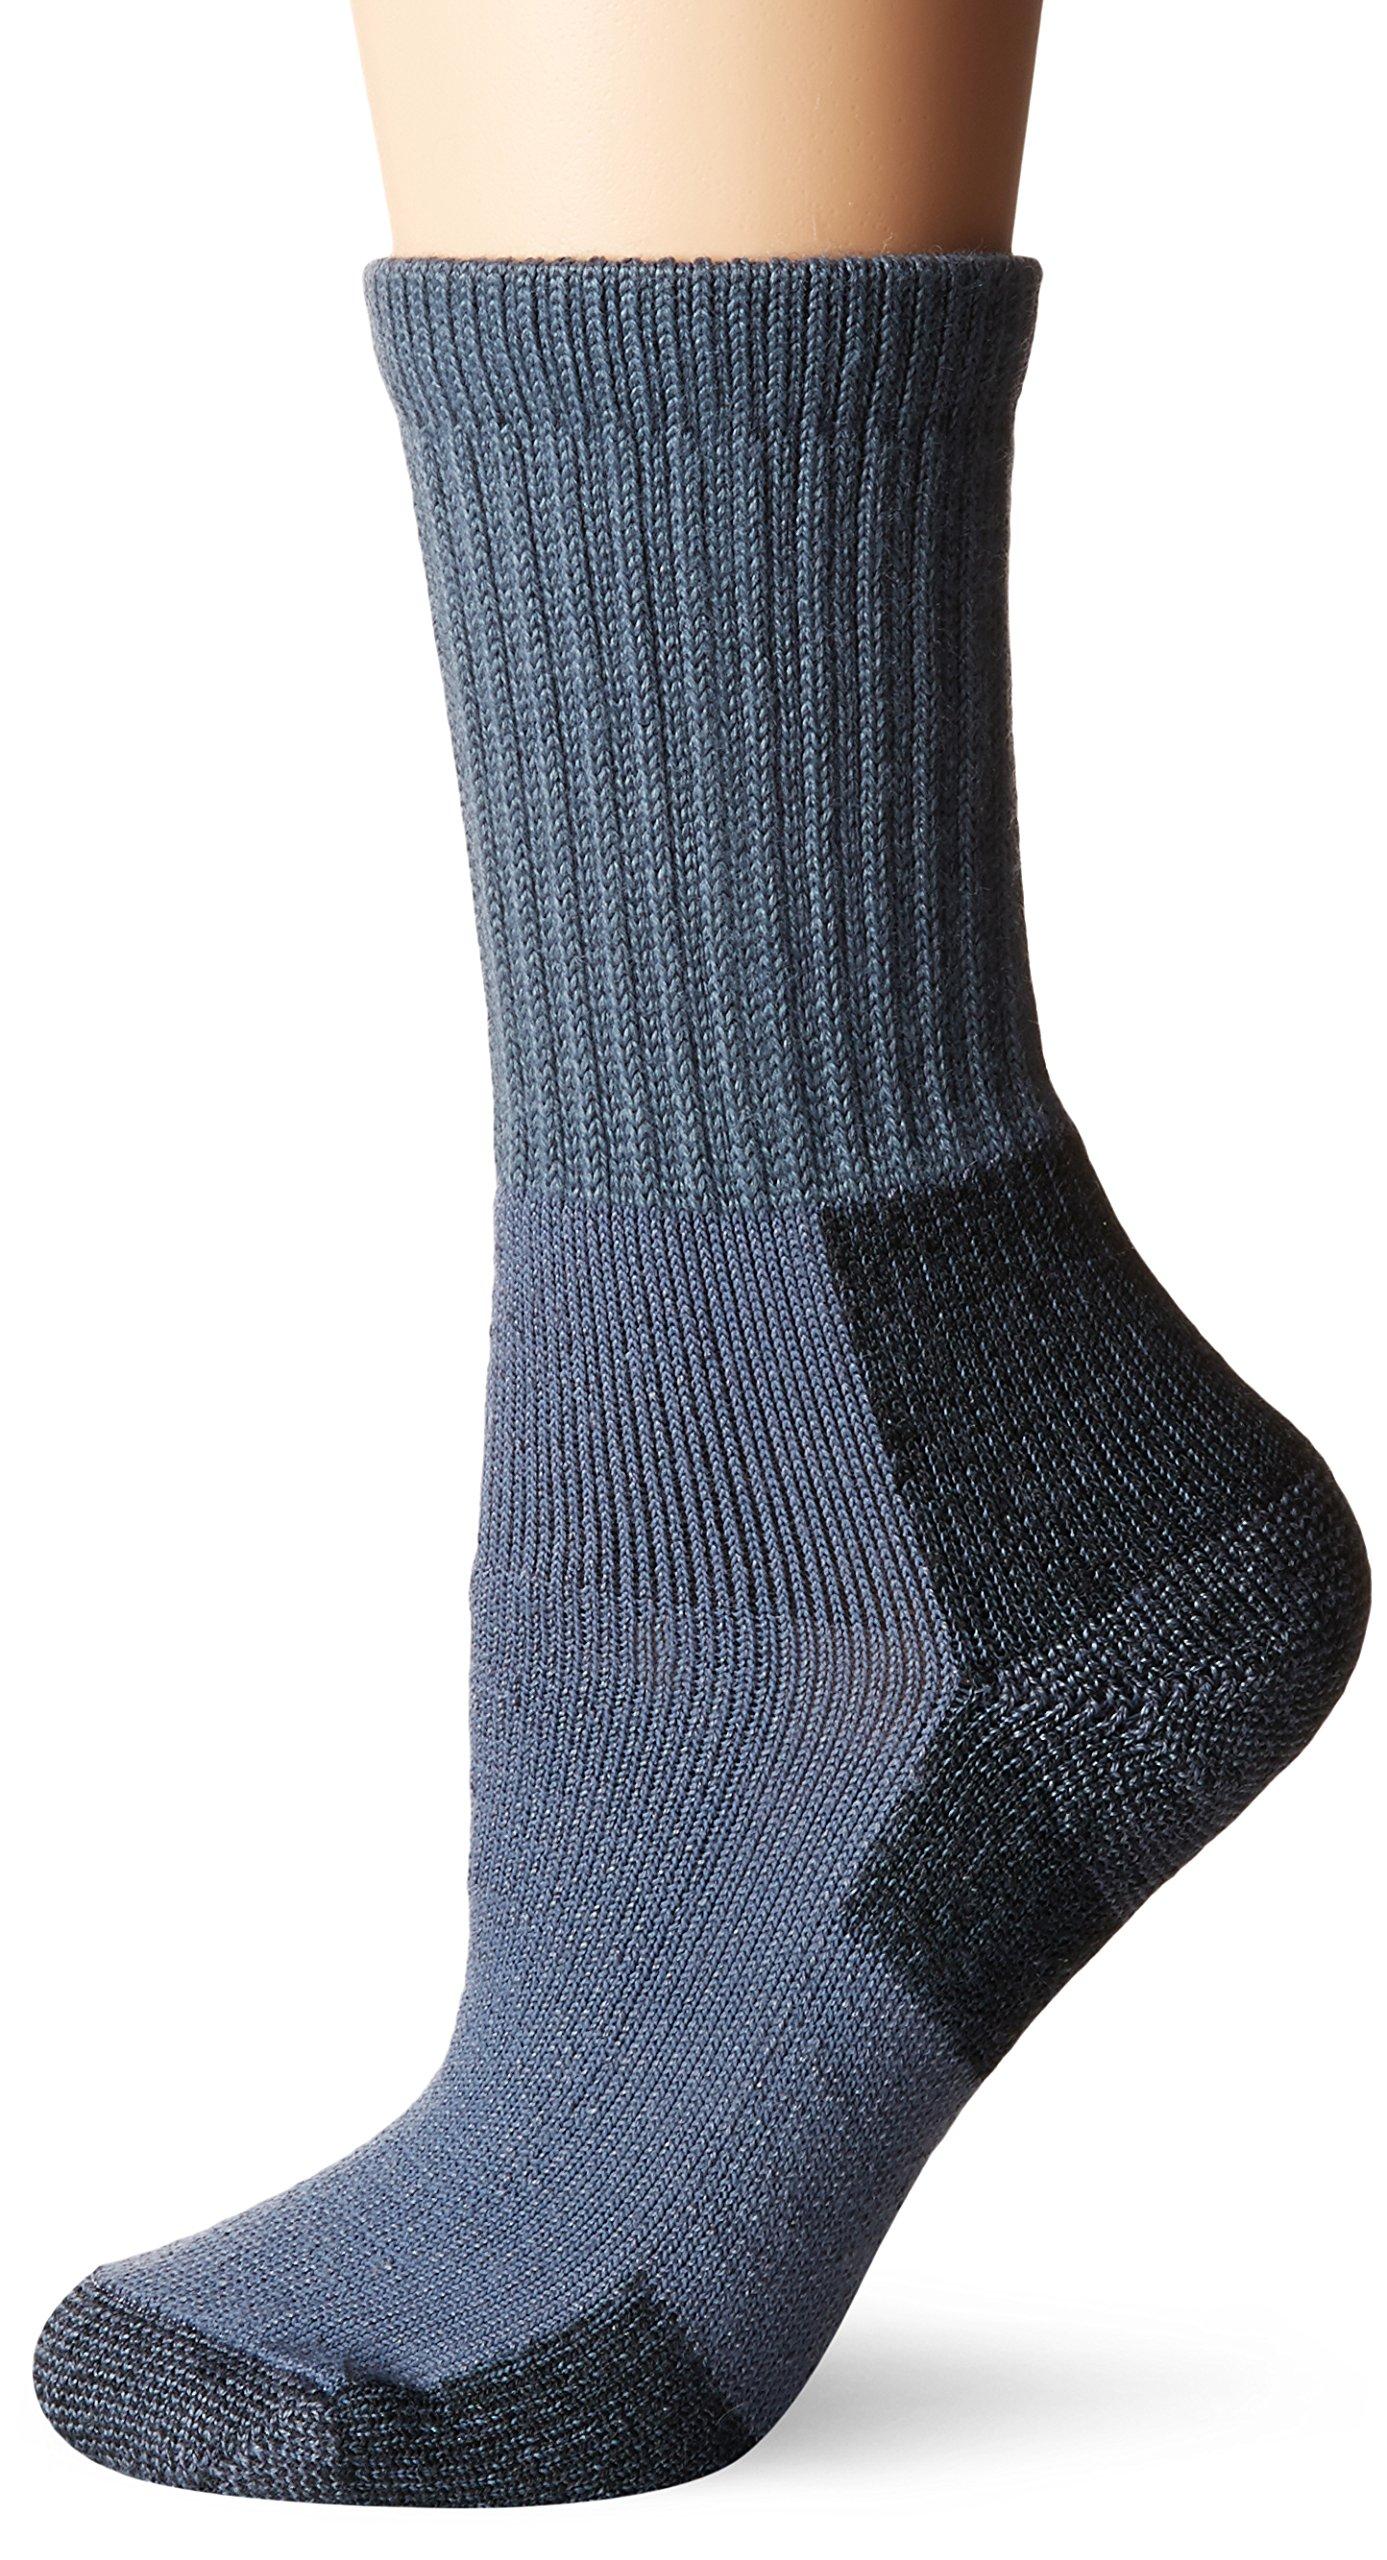 Thorlos Women's KX Hiking Thick Padded Crew Sock, Slate Blue, Medium